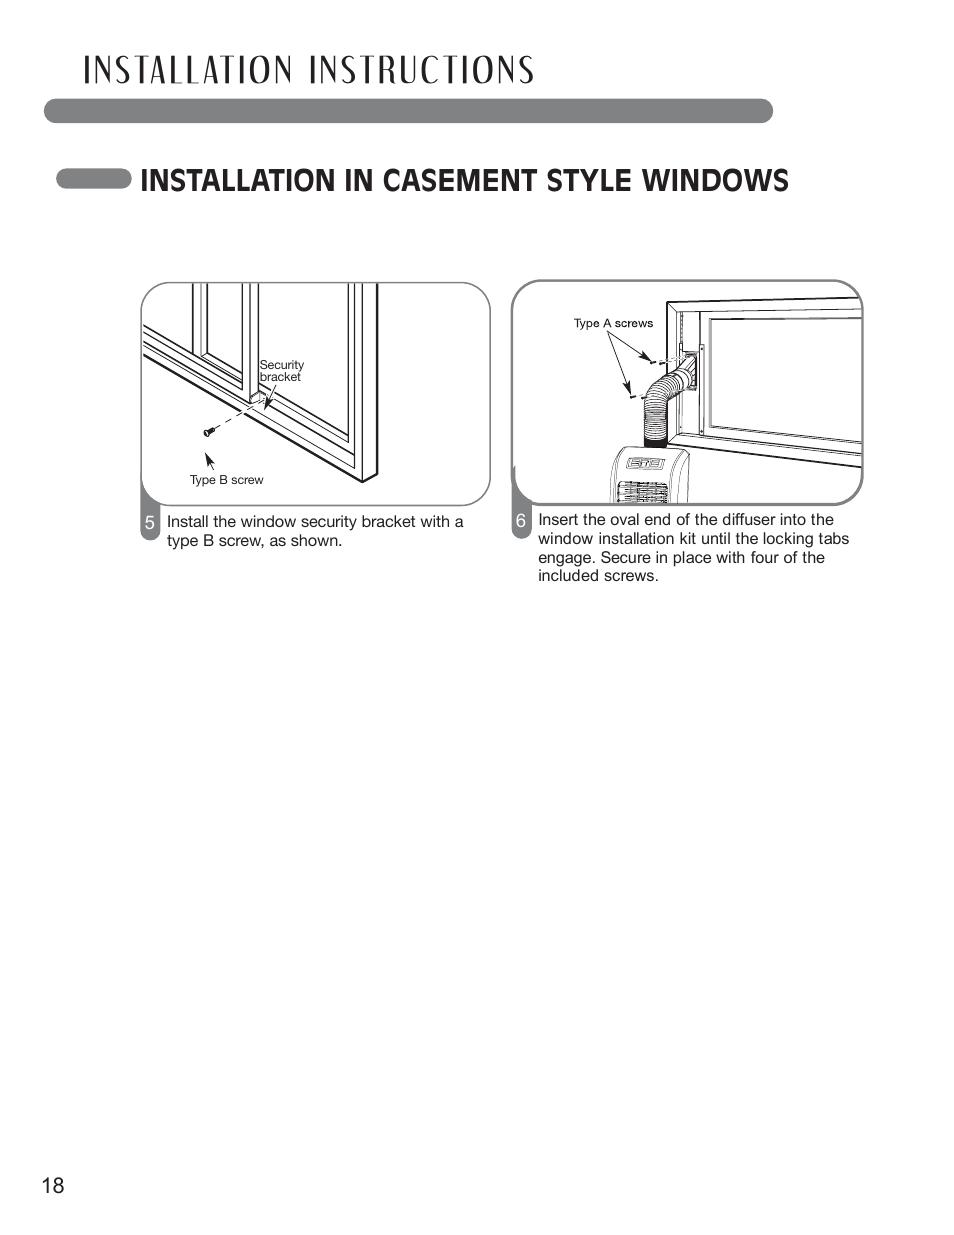 installation in casement style windows lg lp0711wnr user manual rh manualsdir com User Manual PDF Service Manuals